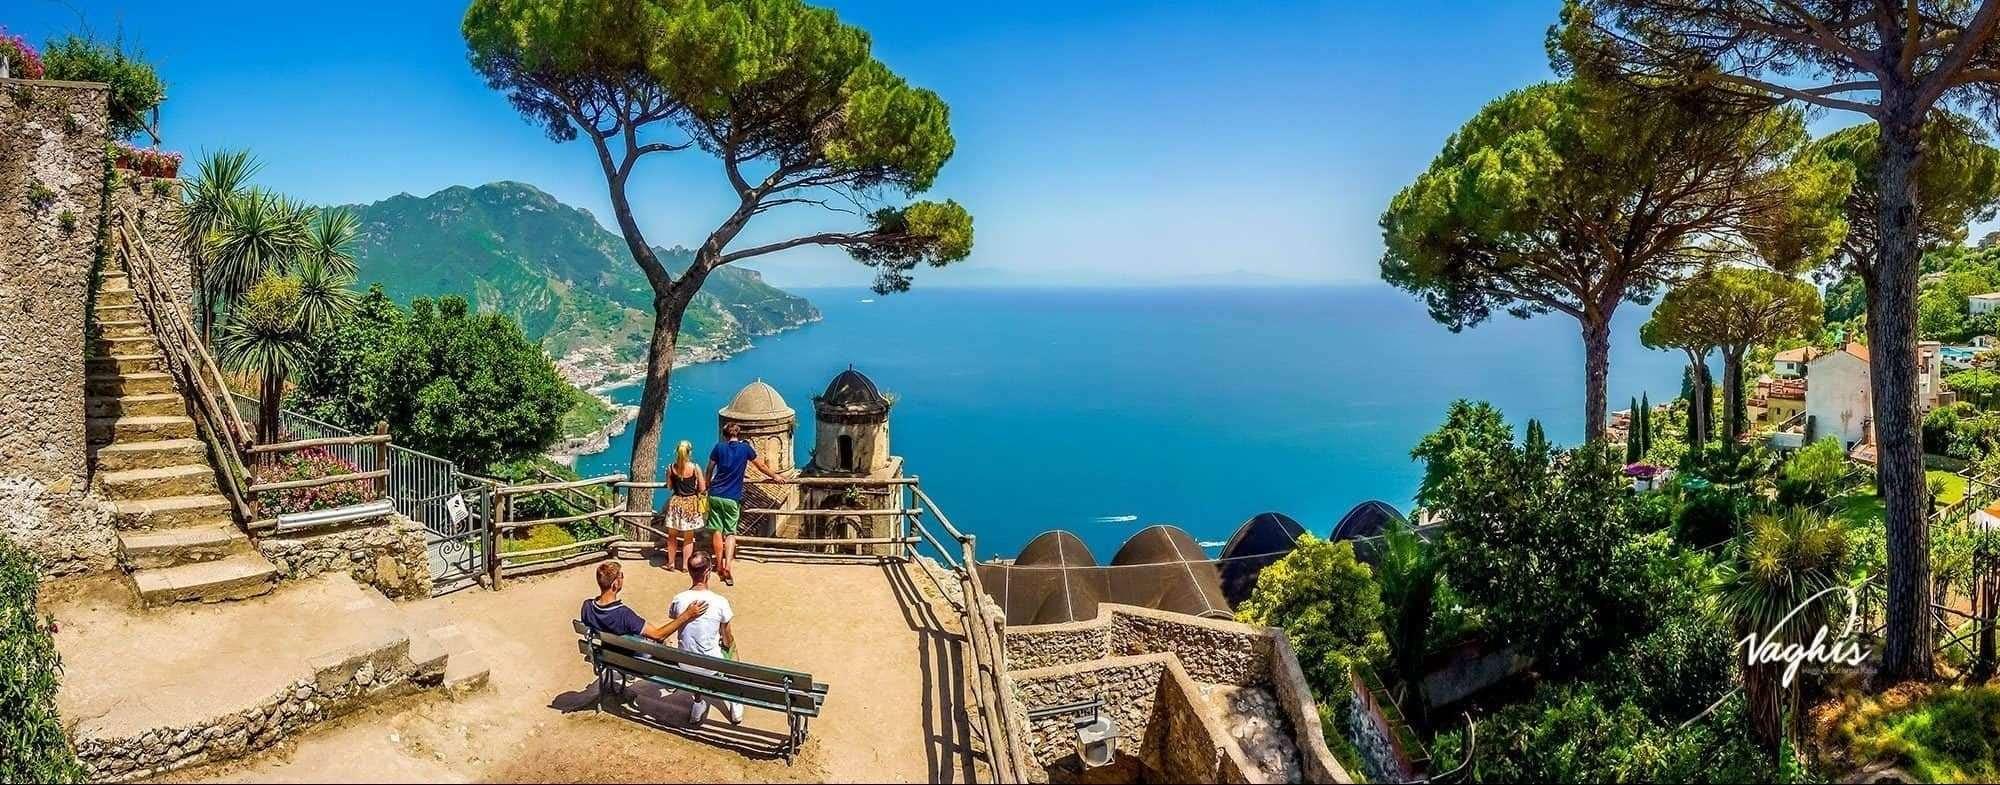 Ravello - © Vaghis viaggi & turismo Italia - Tutti i diritti riservati